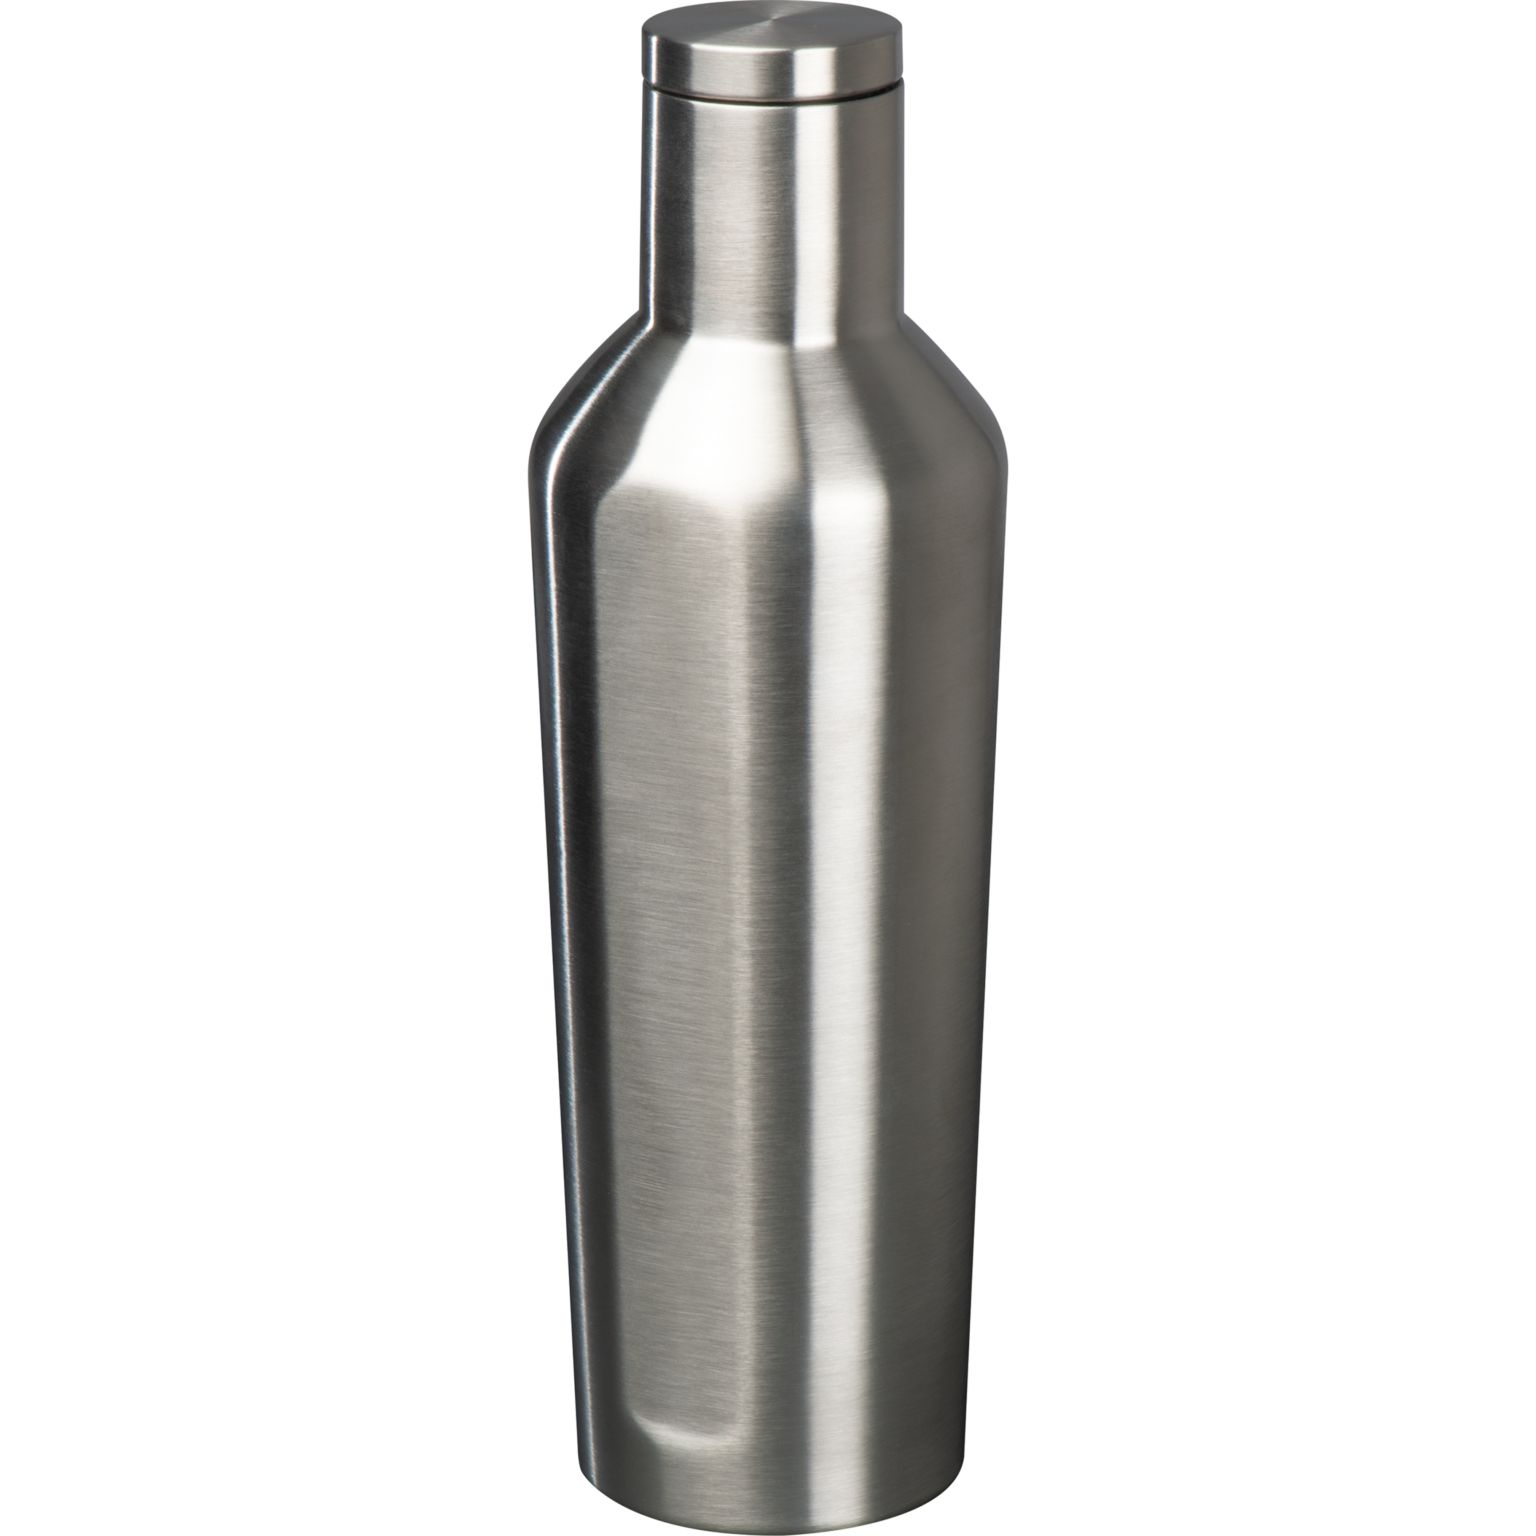 Vacuum drinking bottle